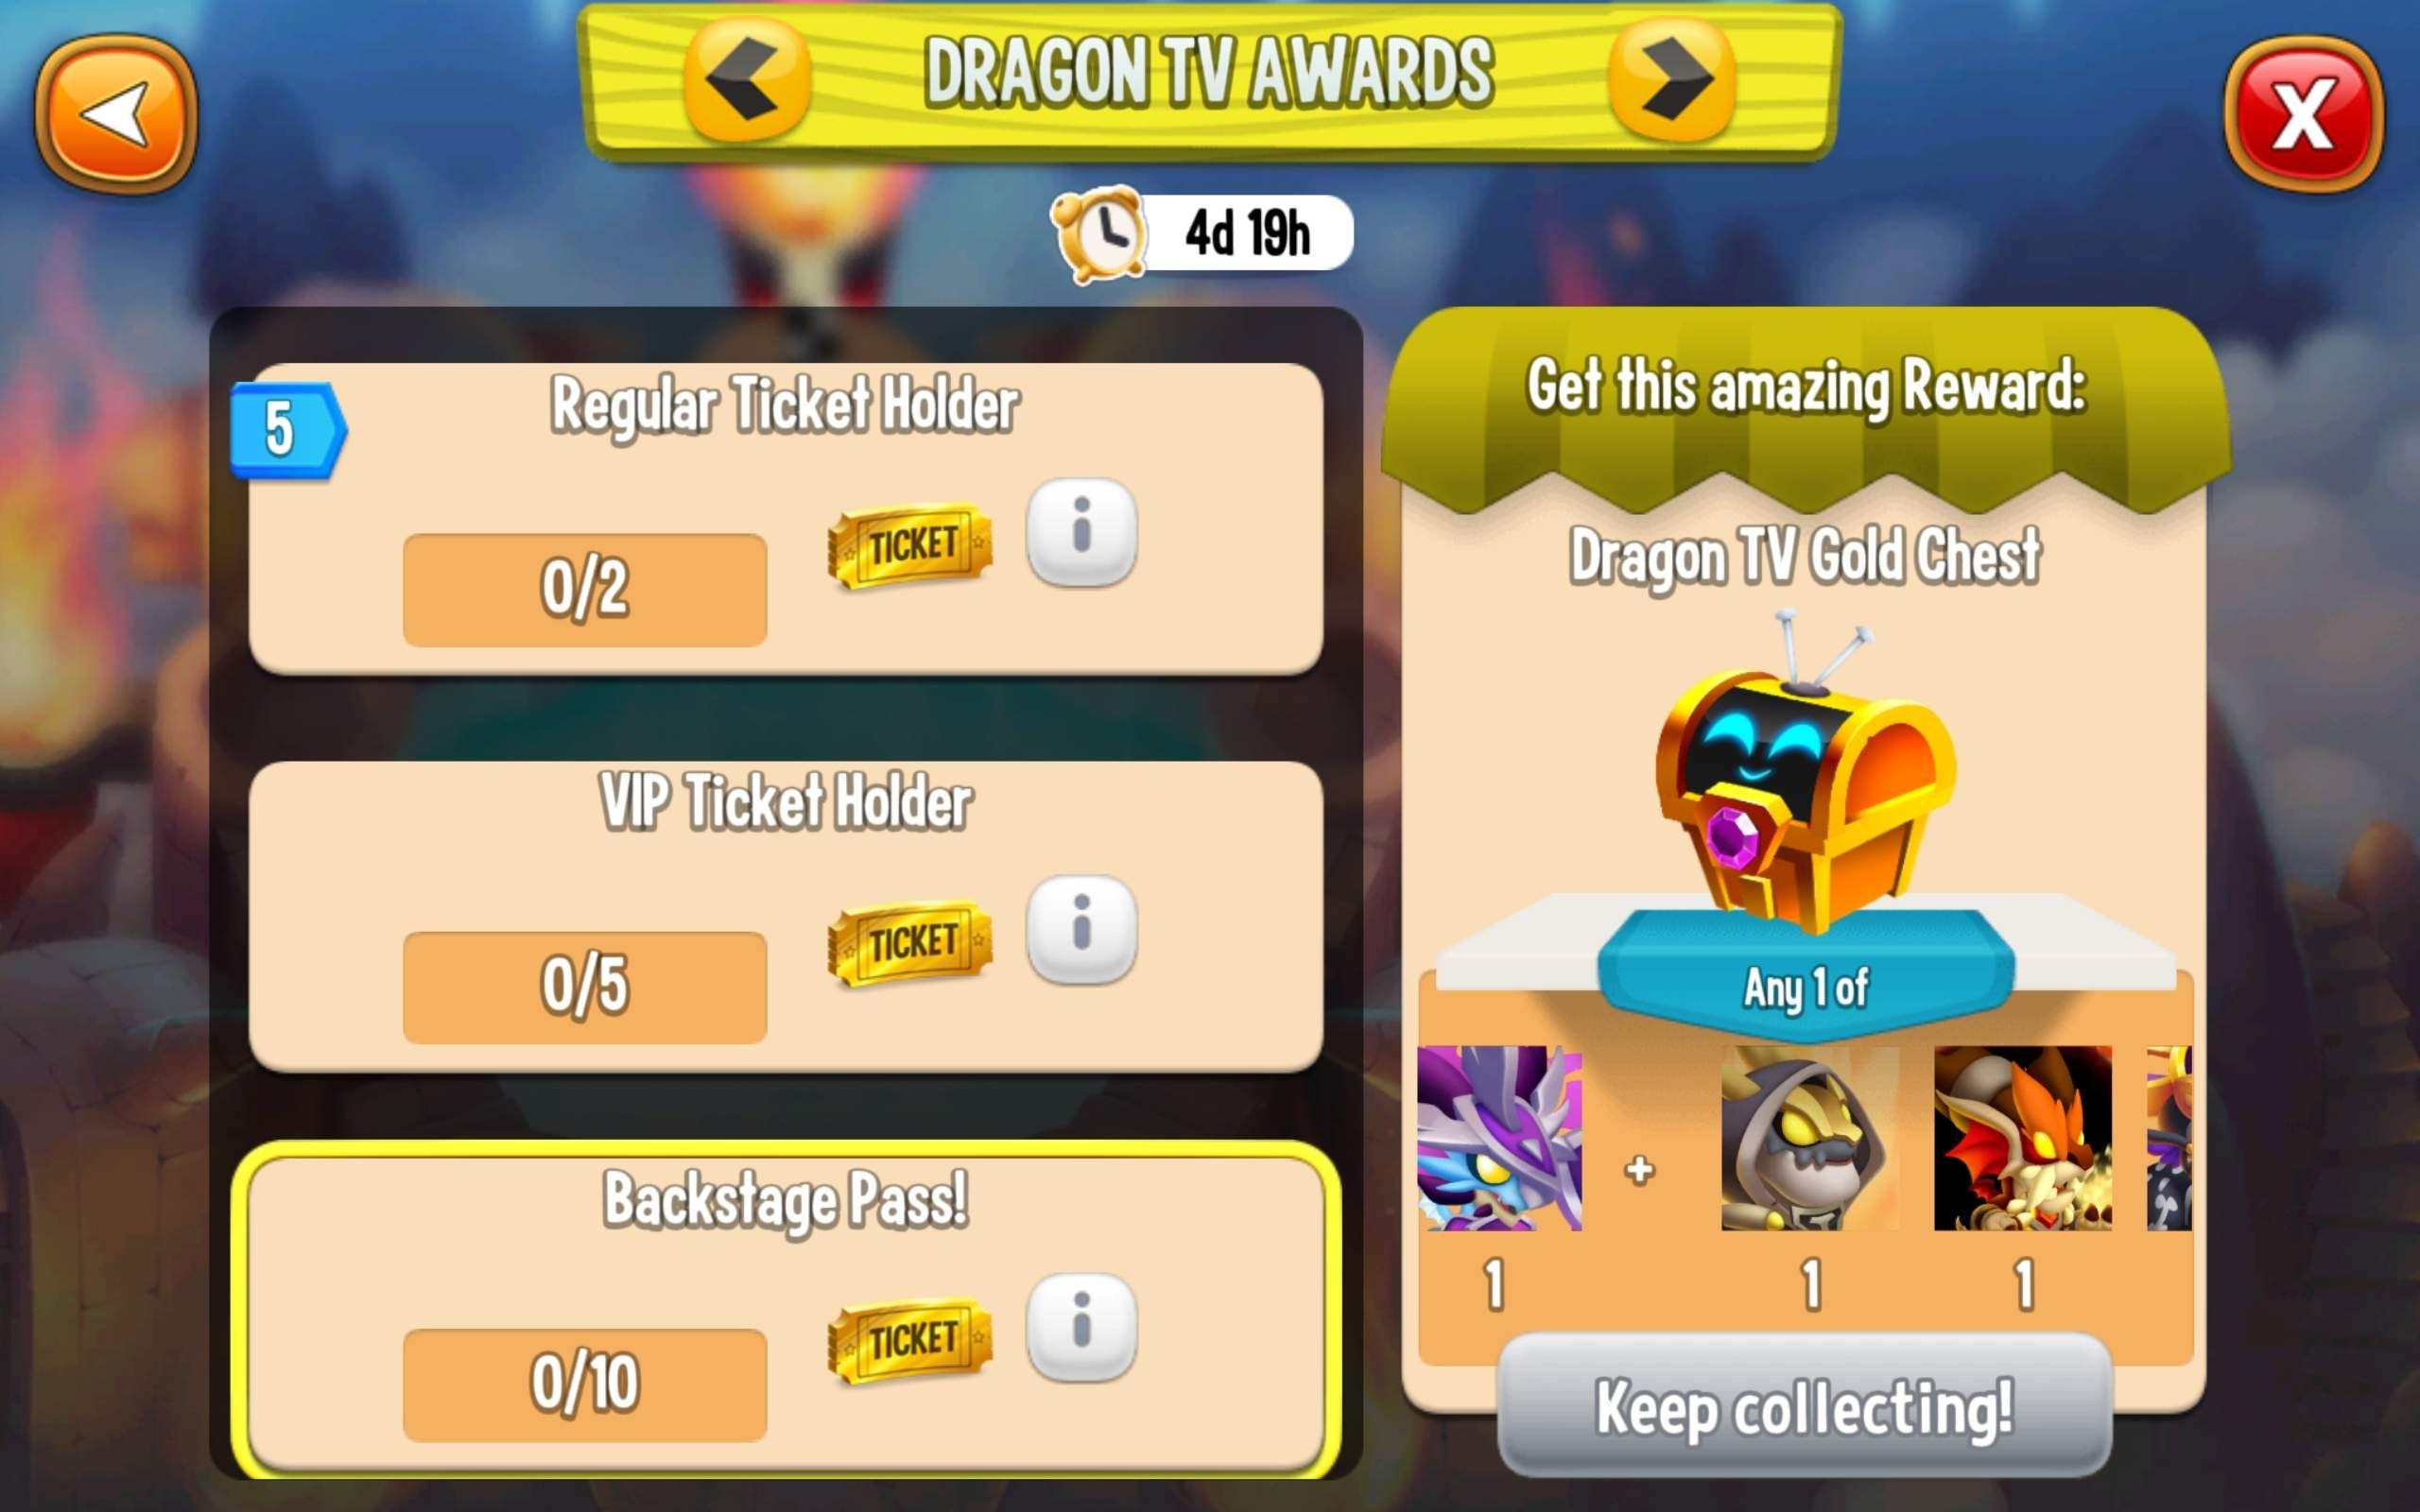 0_1622088754371_DragonCity_2021-05-26-10-04-04.jpg